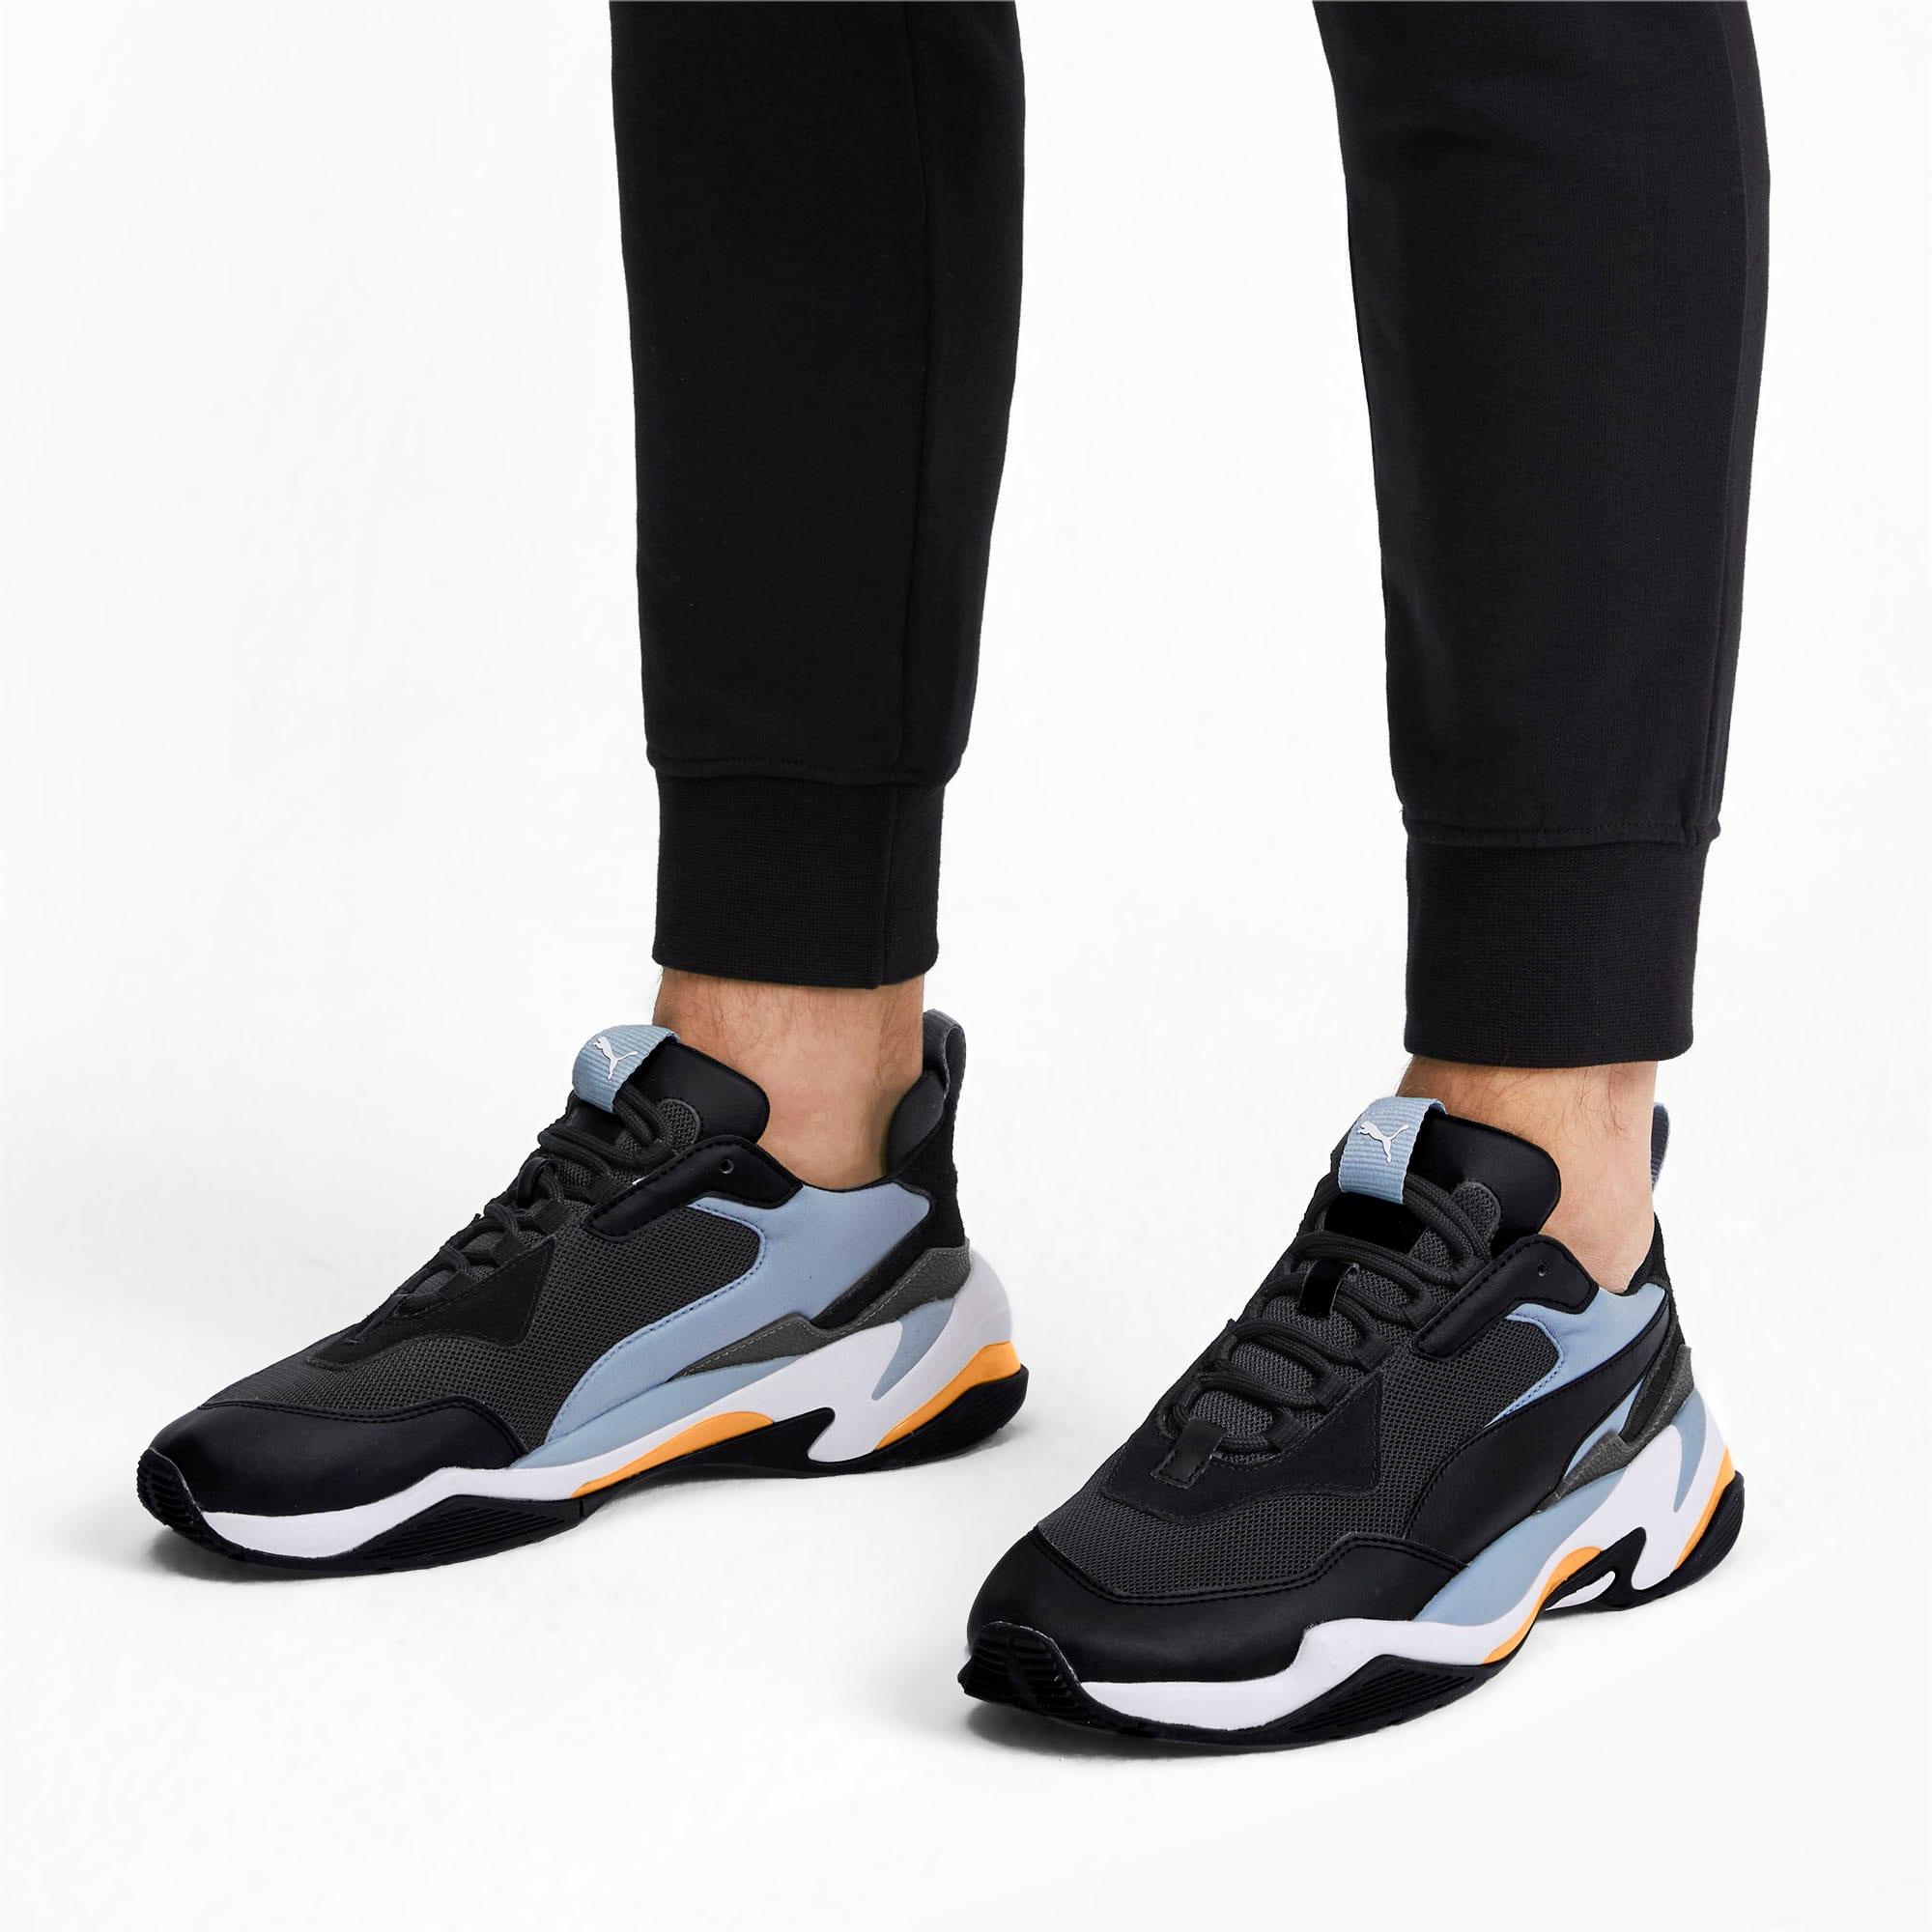 Thumbnail 2 of Thunder Fashion 2.0 sportschoenen, P Black-Faded Denim-P White, medium